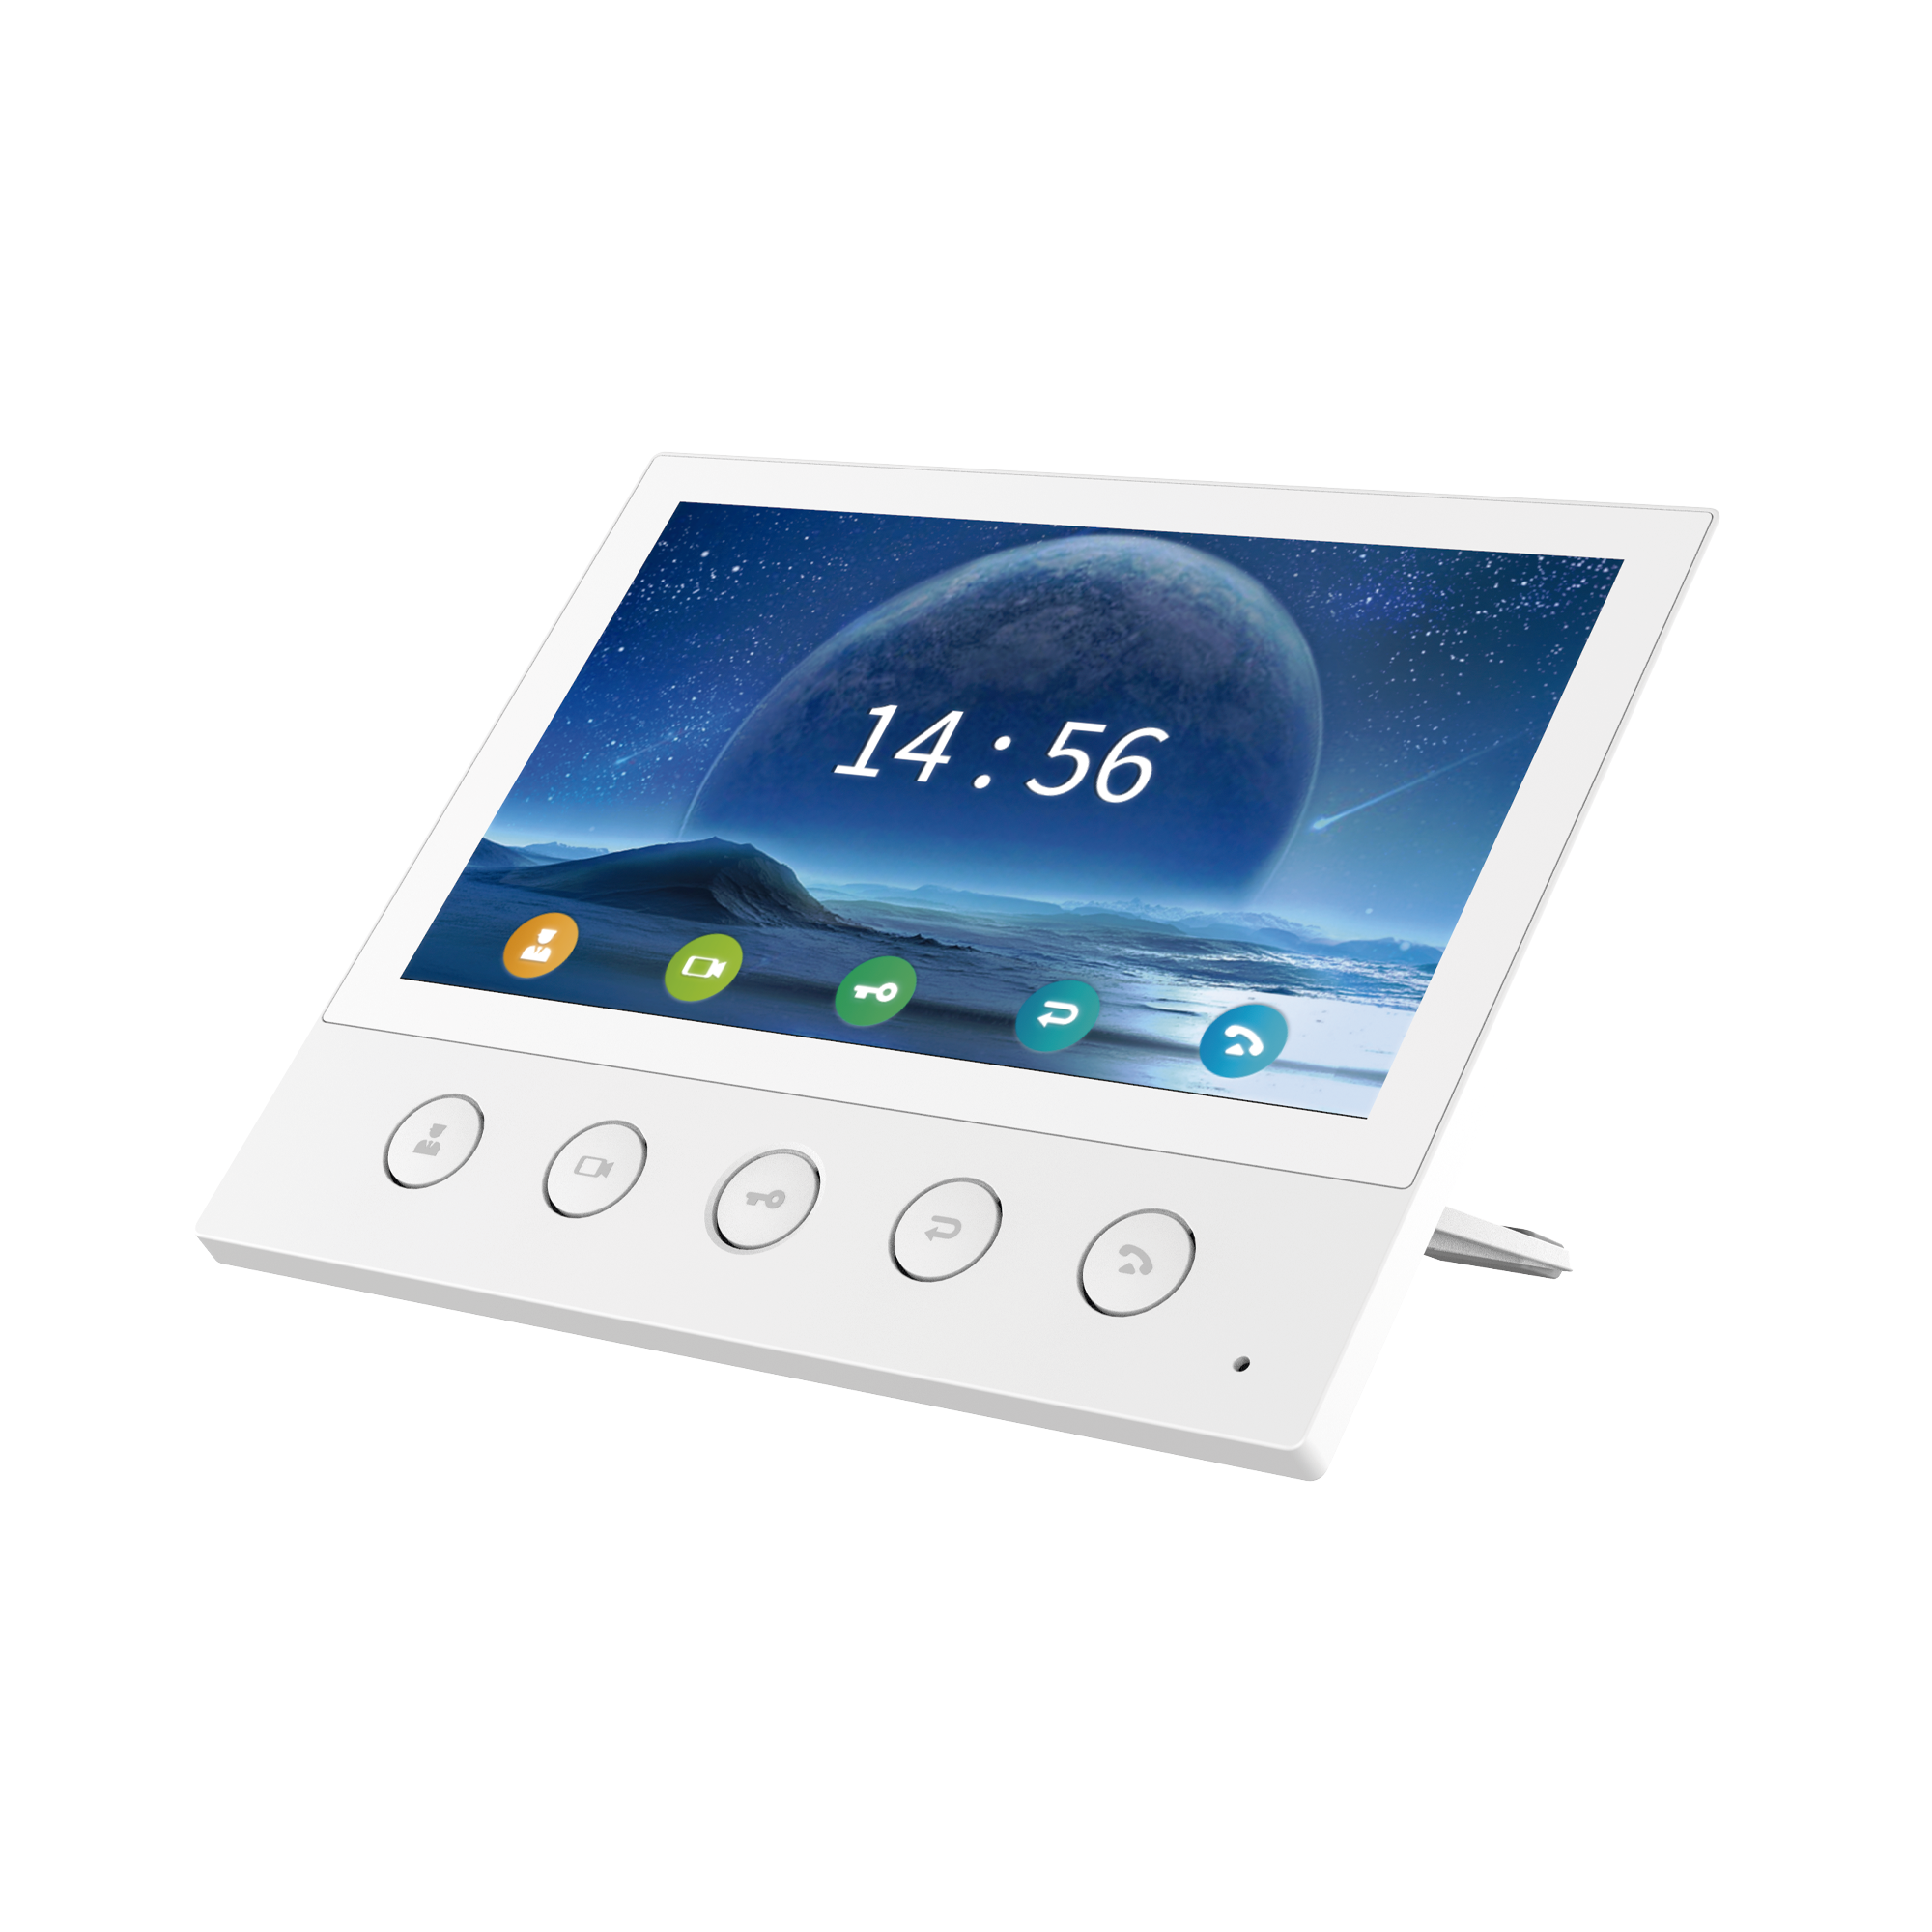 Monitor IP/SIP para interior, Wi-Fi, pantalla táctil de 7, audio de 2 vías, PoE, 8 interfaces de entrada de alarma.